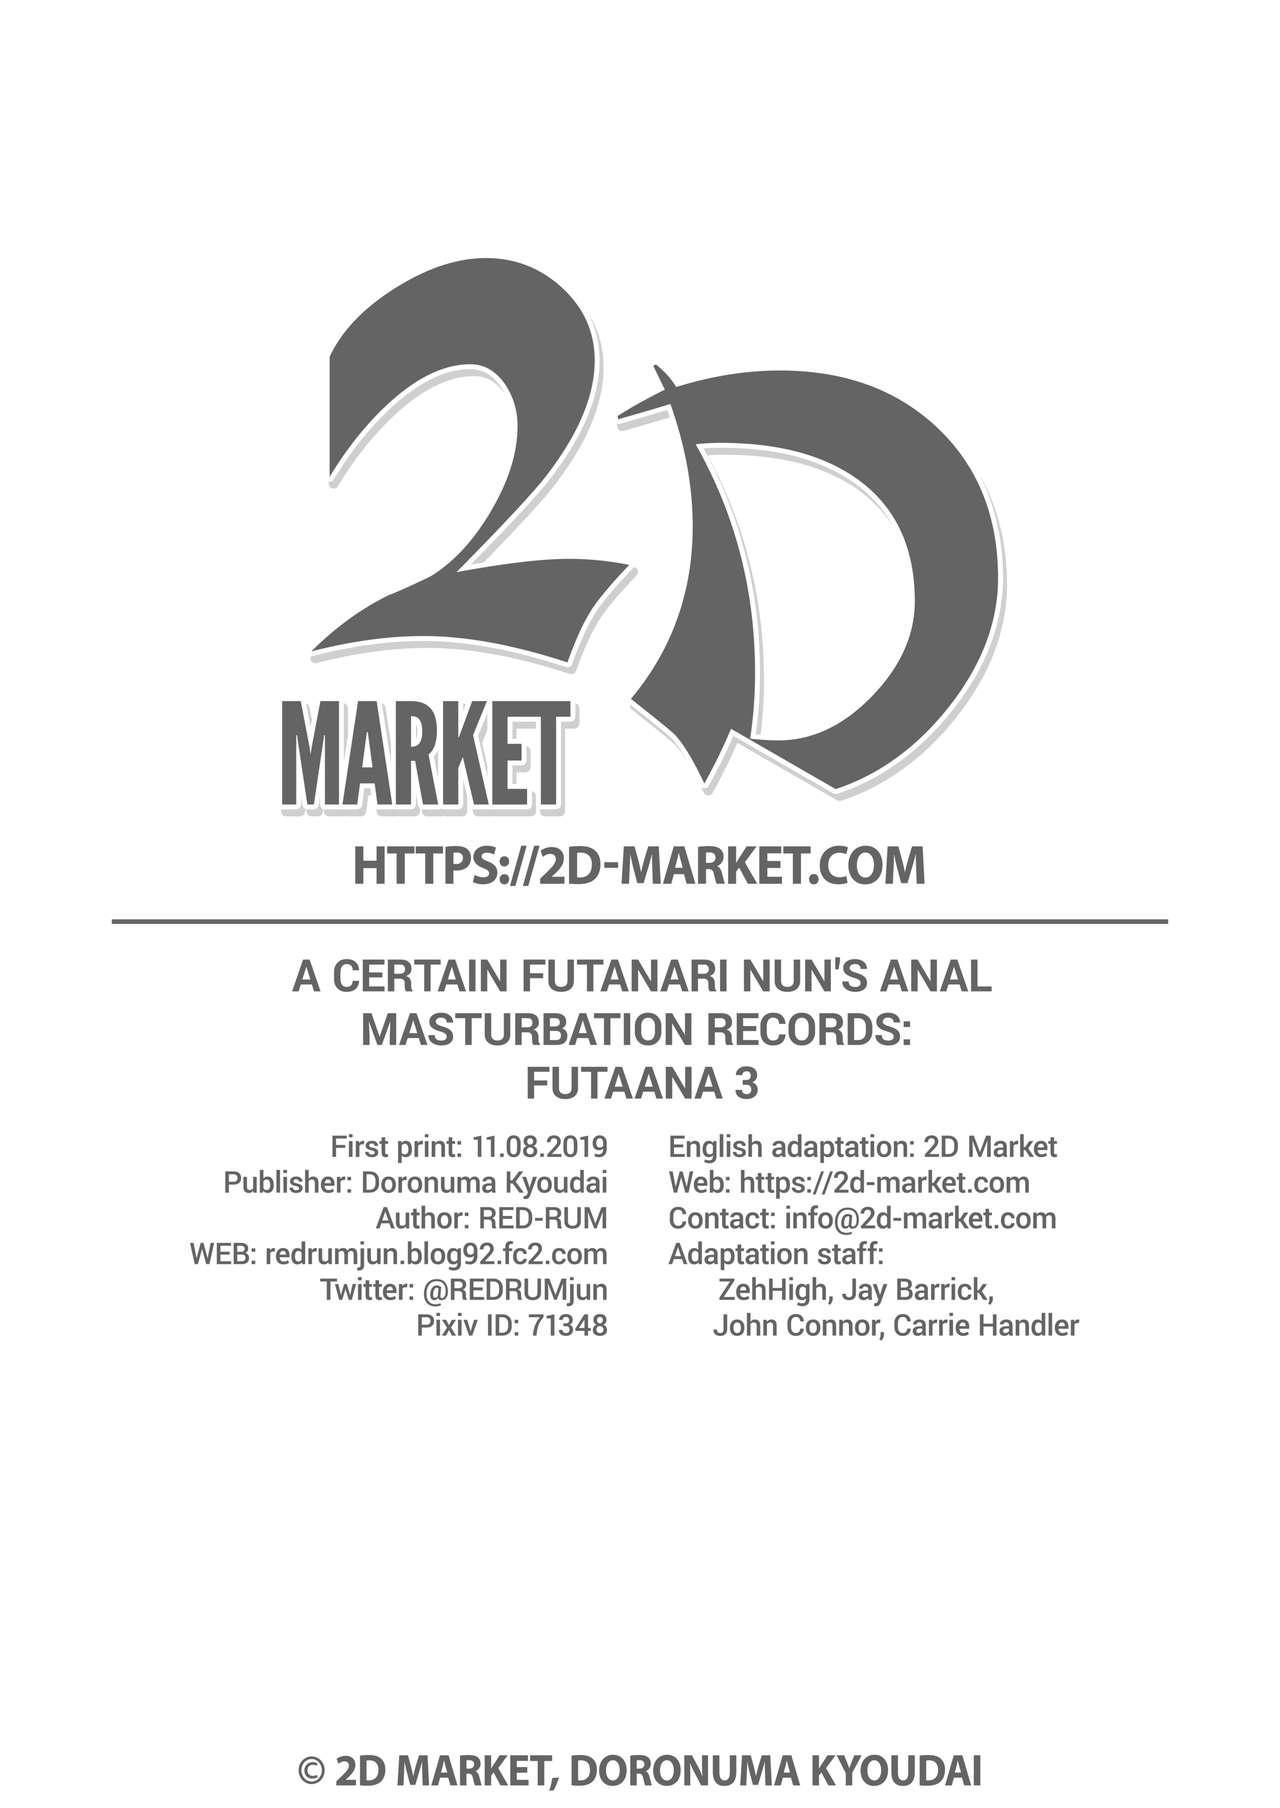 [Doronuma Kyoudai (RED-RUM)] FutaAna ††† | FutaAna - A Certain Futanari Nun's Anal Masturbation Records - Chapter 3 [English] [2d-market.com] [Decensored] [Digital] 1